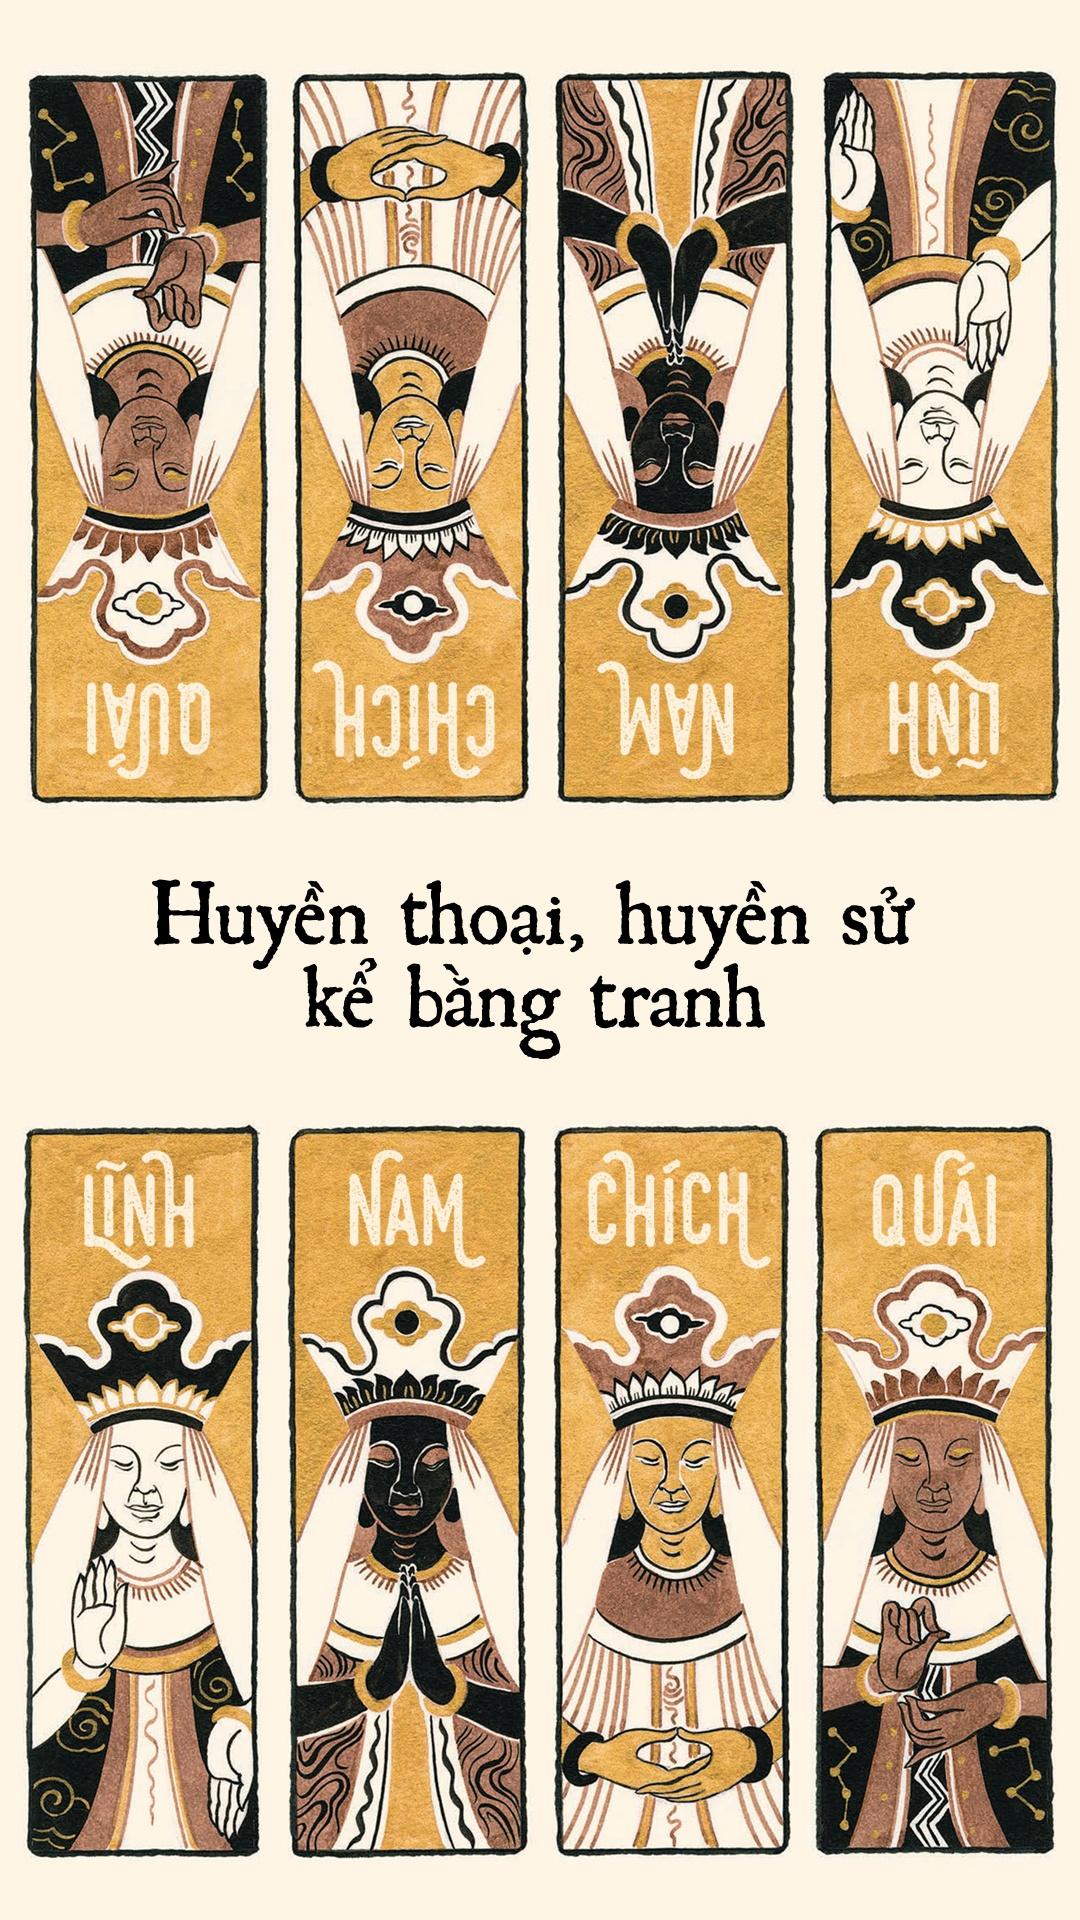 Linh Nam chich quai,  Ta Huy Long,  Art Book anh 1